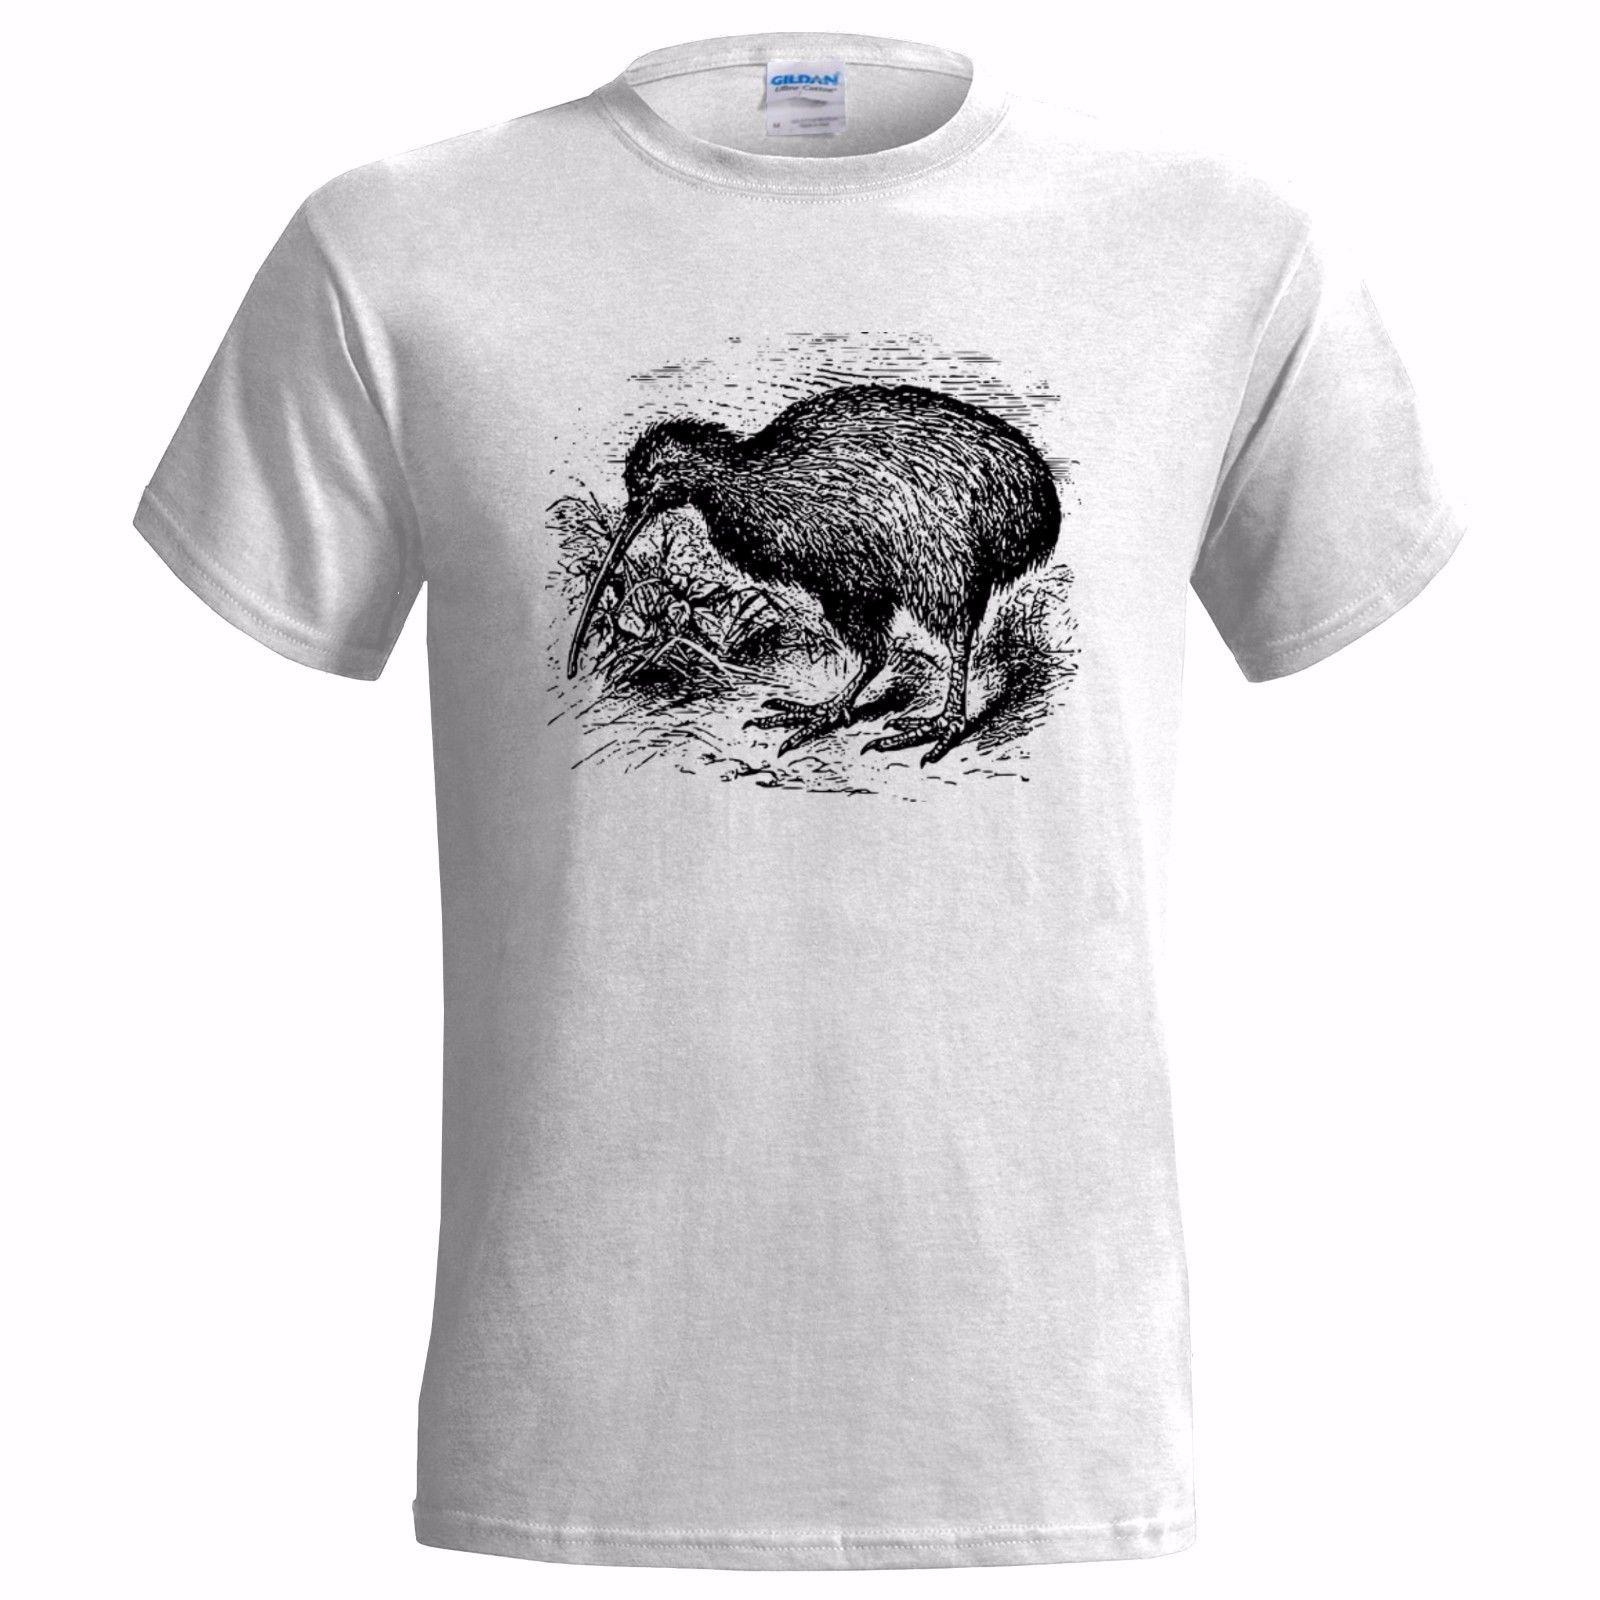 Tops & Tees Men's Clothing Men O Neck Custom Print T Shirt Kiwi Bird Shirt Kiwi Bird Heartbeat T Shirt Funny Tees Tops Fitness Streetwear Harajuku